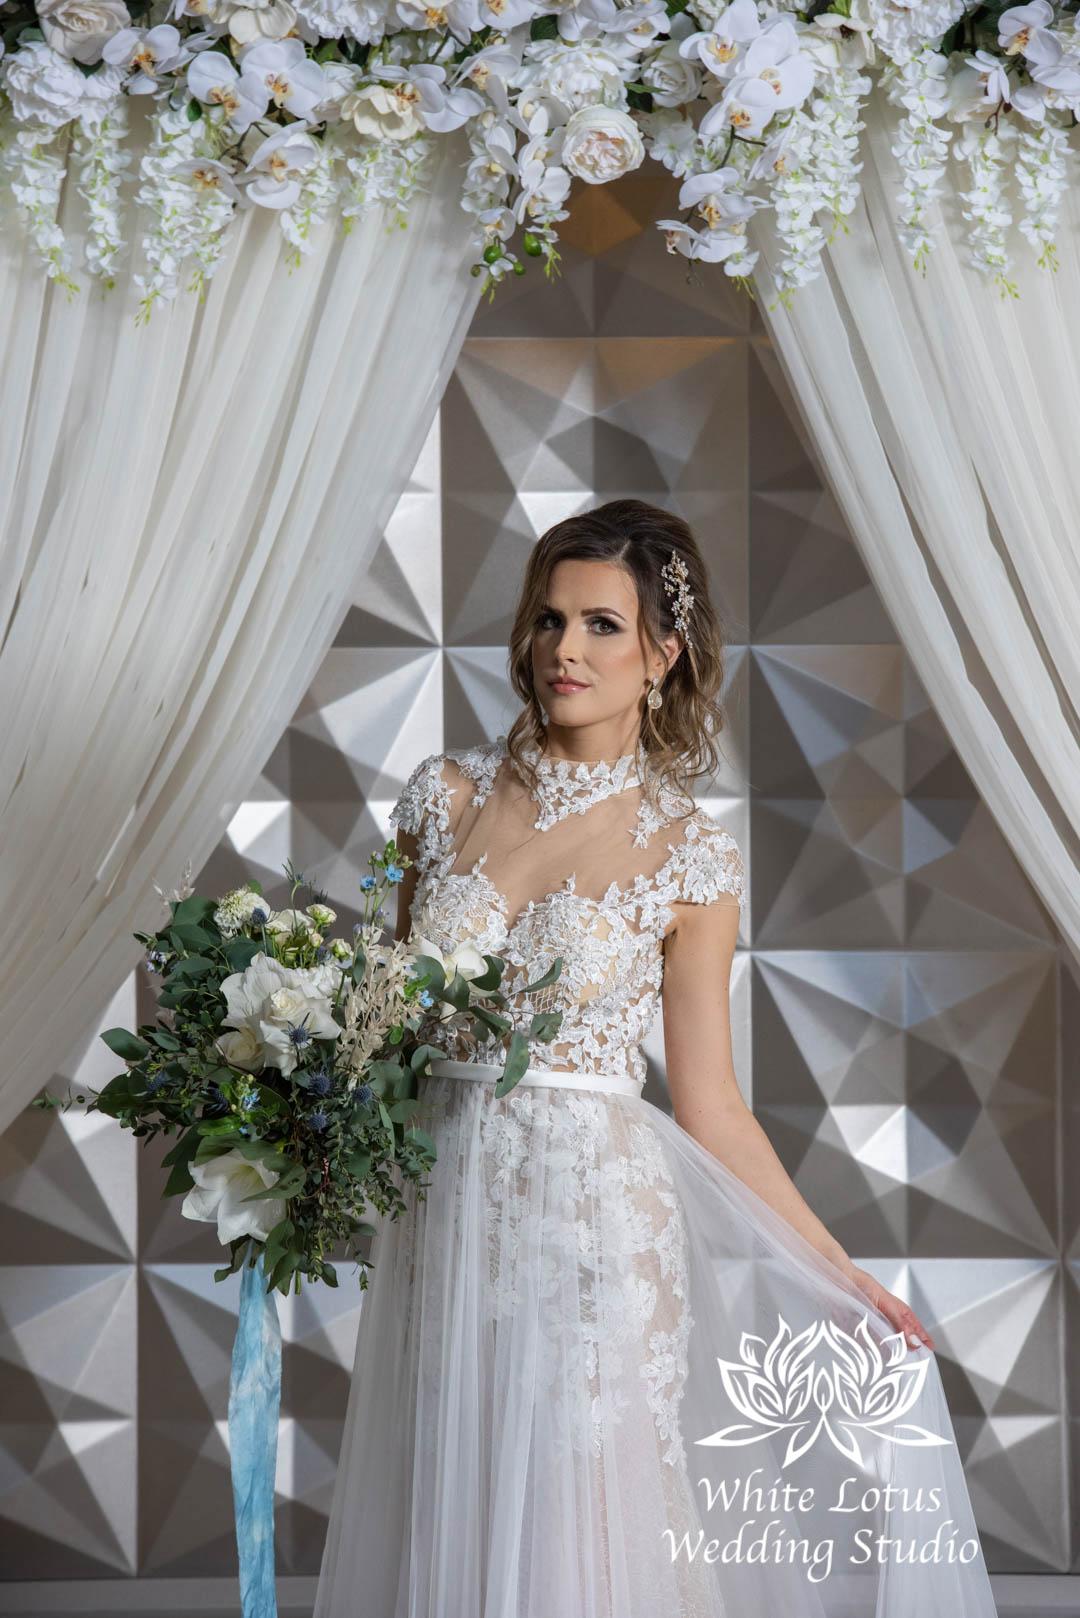 055- GLAM WINTERLUXE WEDDING INSPIRATION